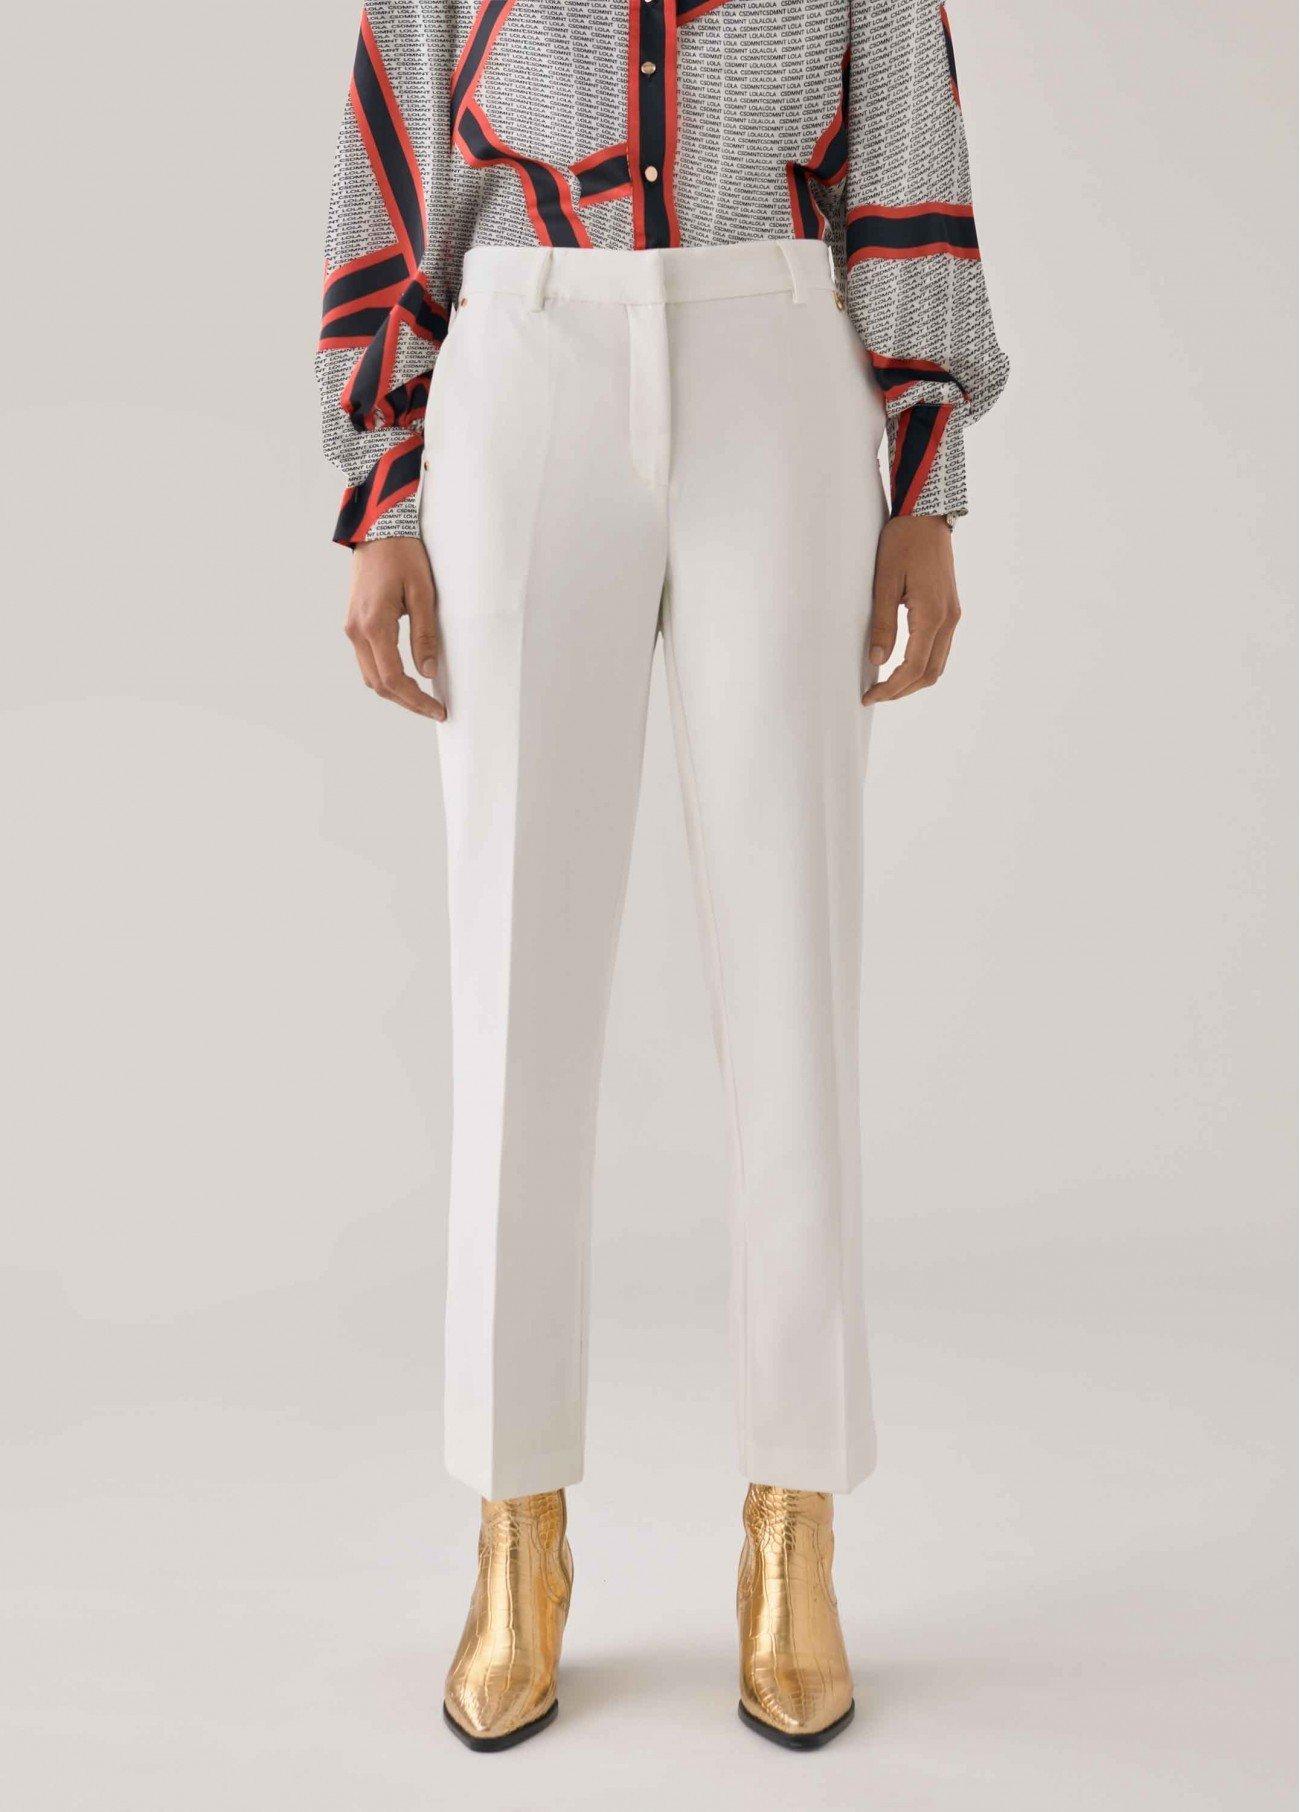 Pantalón con elástico LOVE, blanco, negro 2